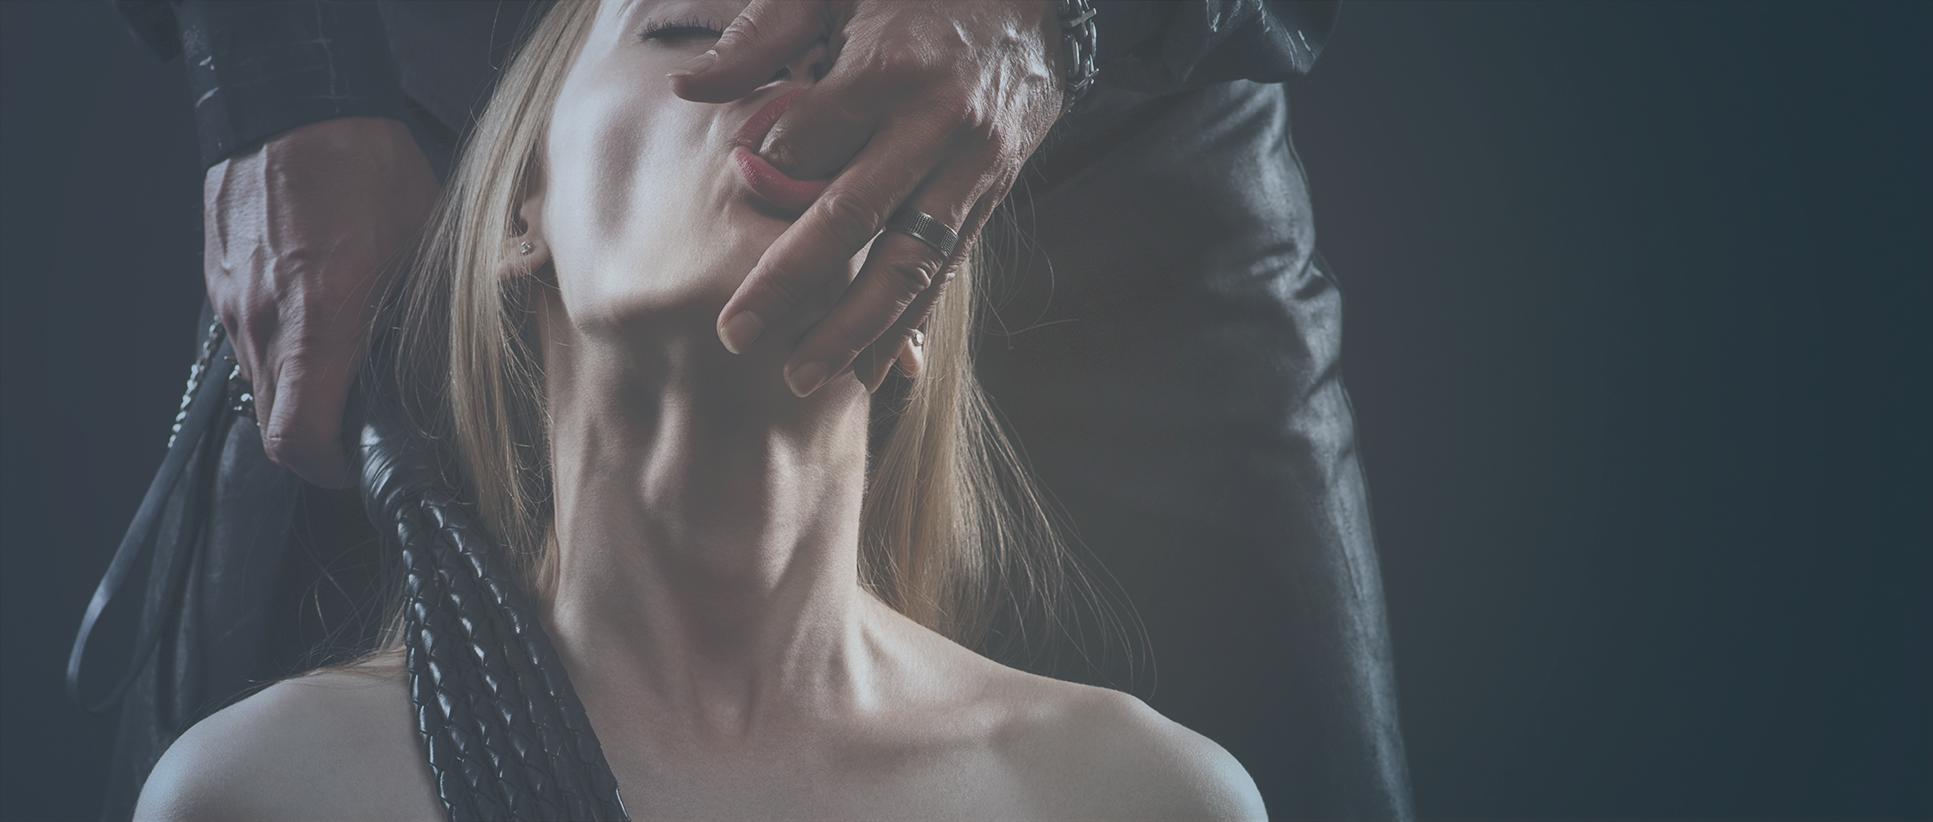 sexo masoquista sexo a dois